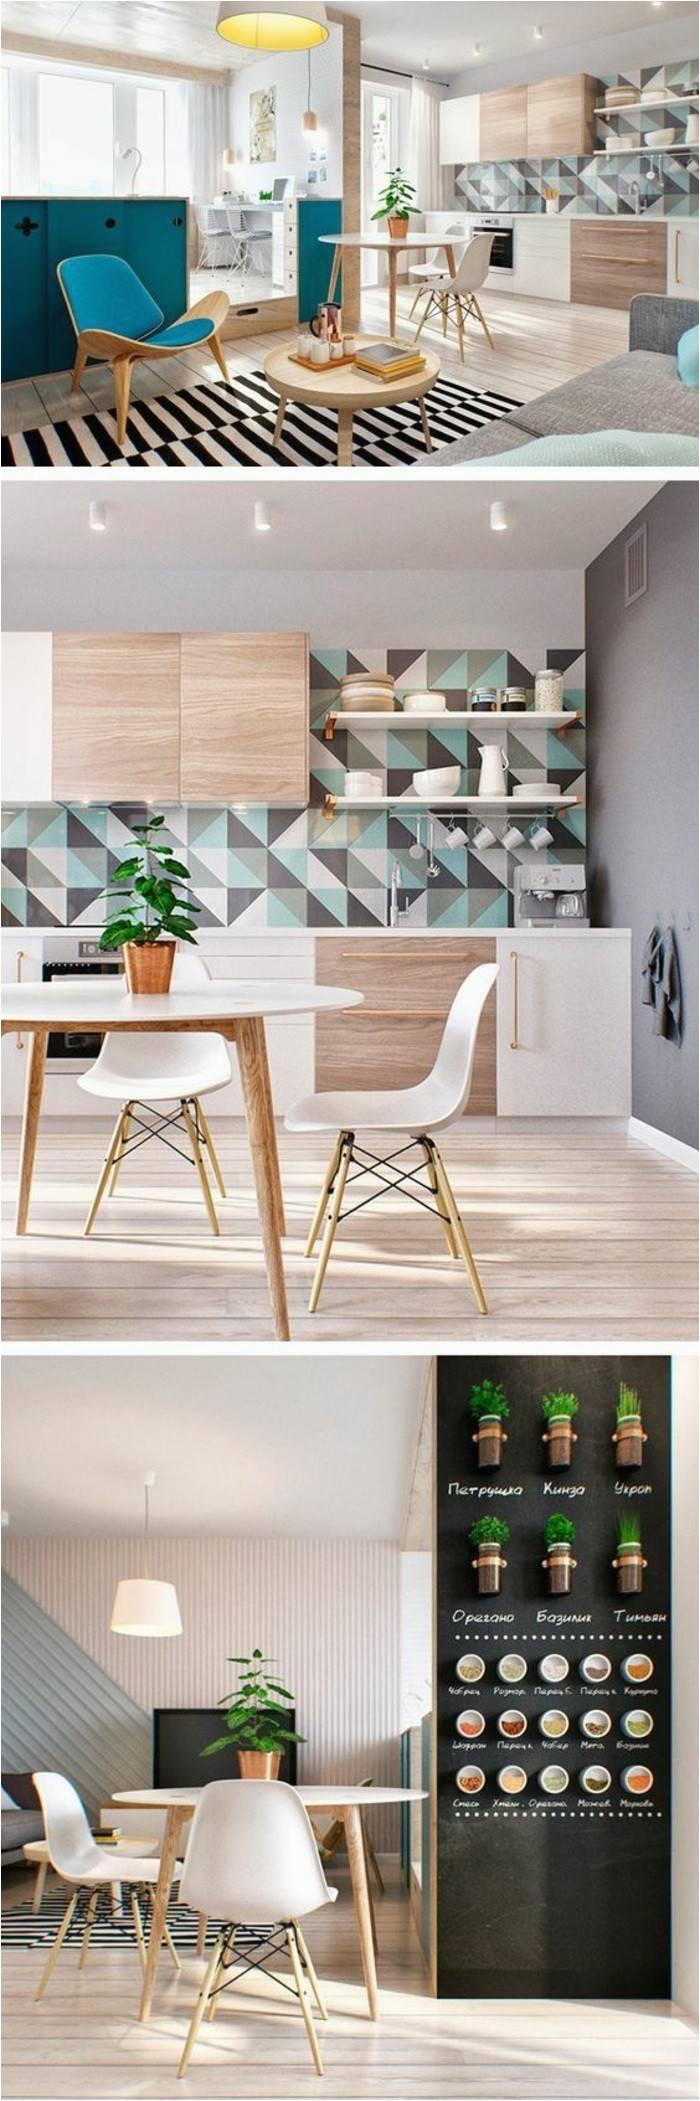 Modern Schlafzimmer Schränke 35 Neu Kücheninsel Massivholz Pic